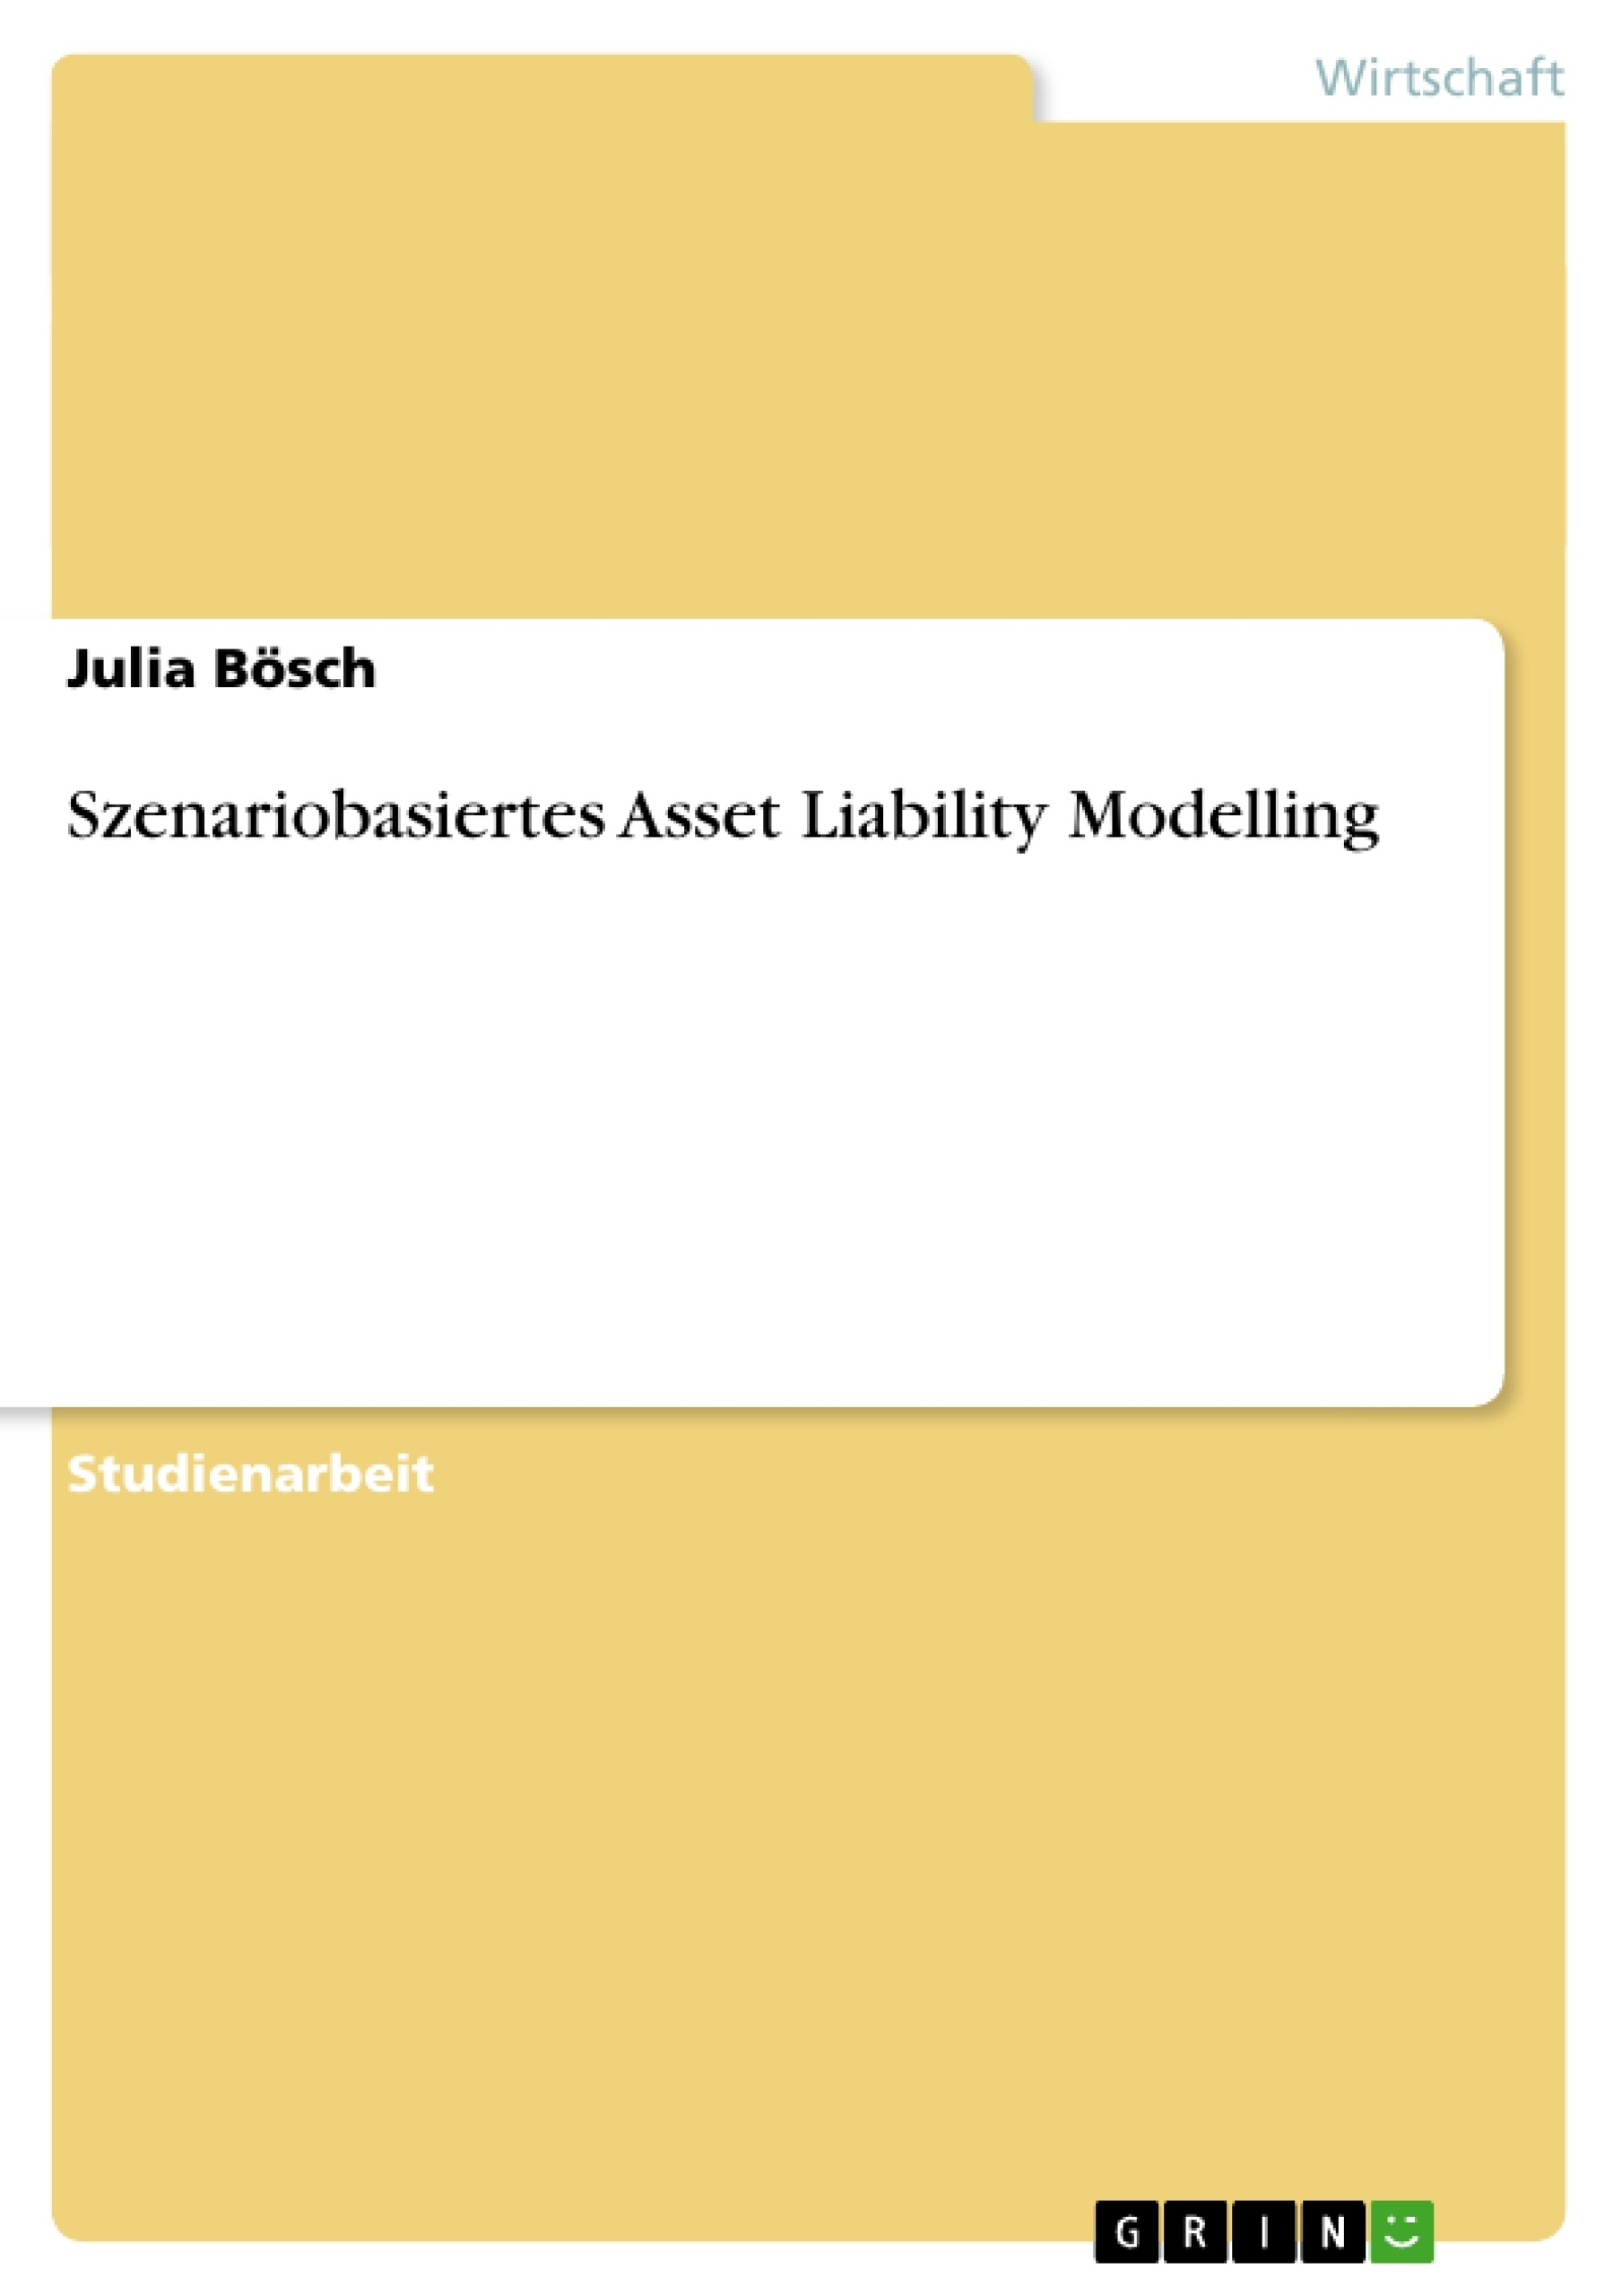 Titel: Szenariobasiertes Asset Liability Modelling